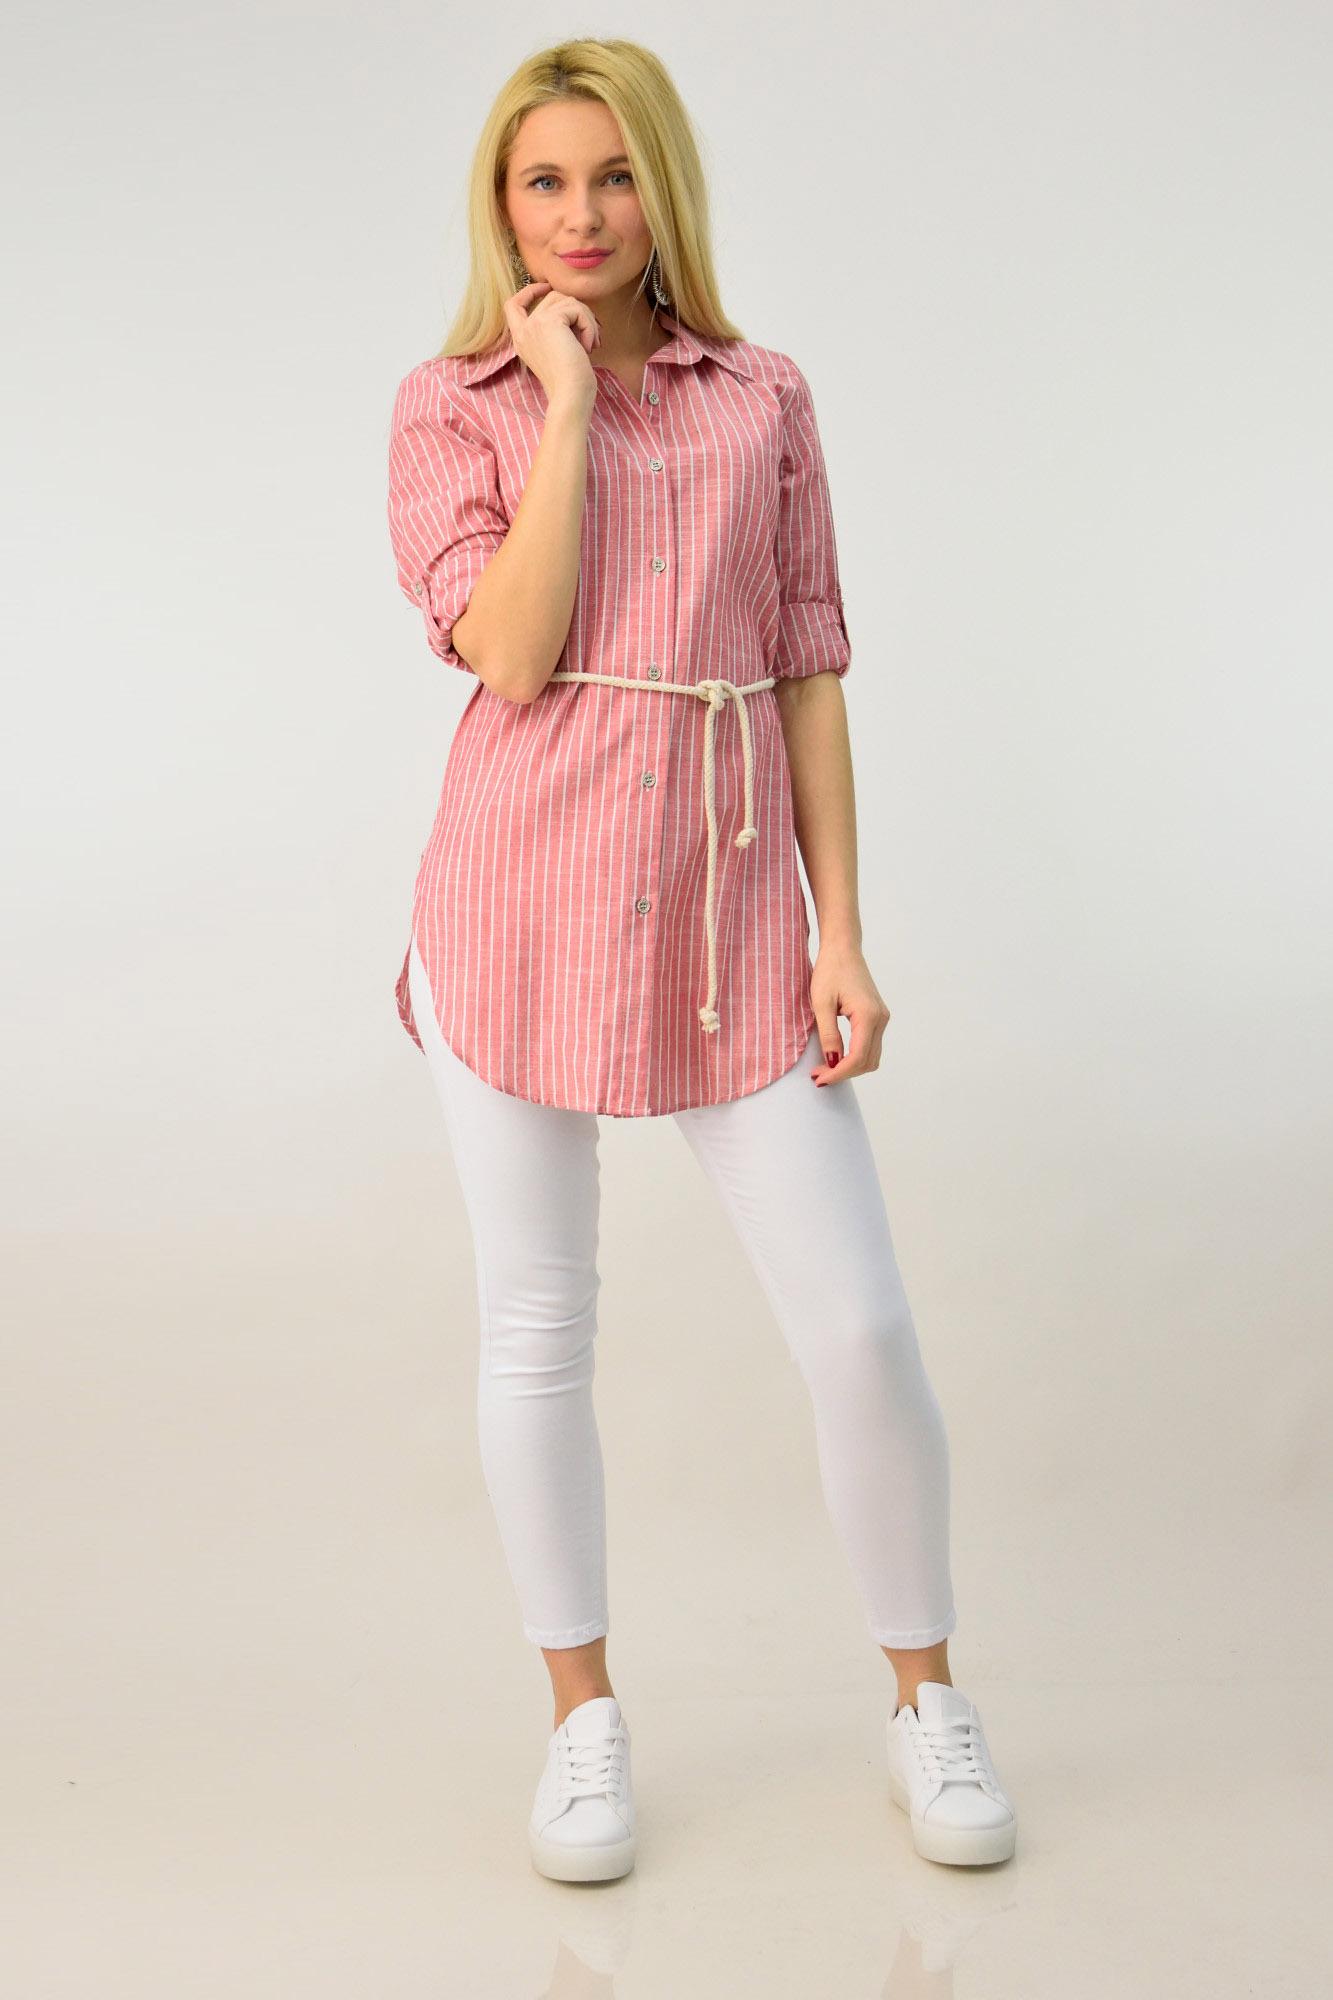 94d62a5d1f8c Ανοιξιάτικη πουκαμίσα ριγέ με ζώνη. Tap to expand